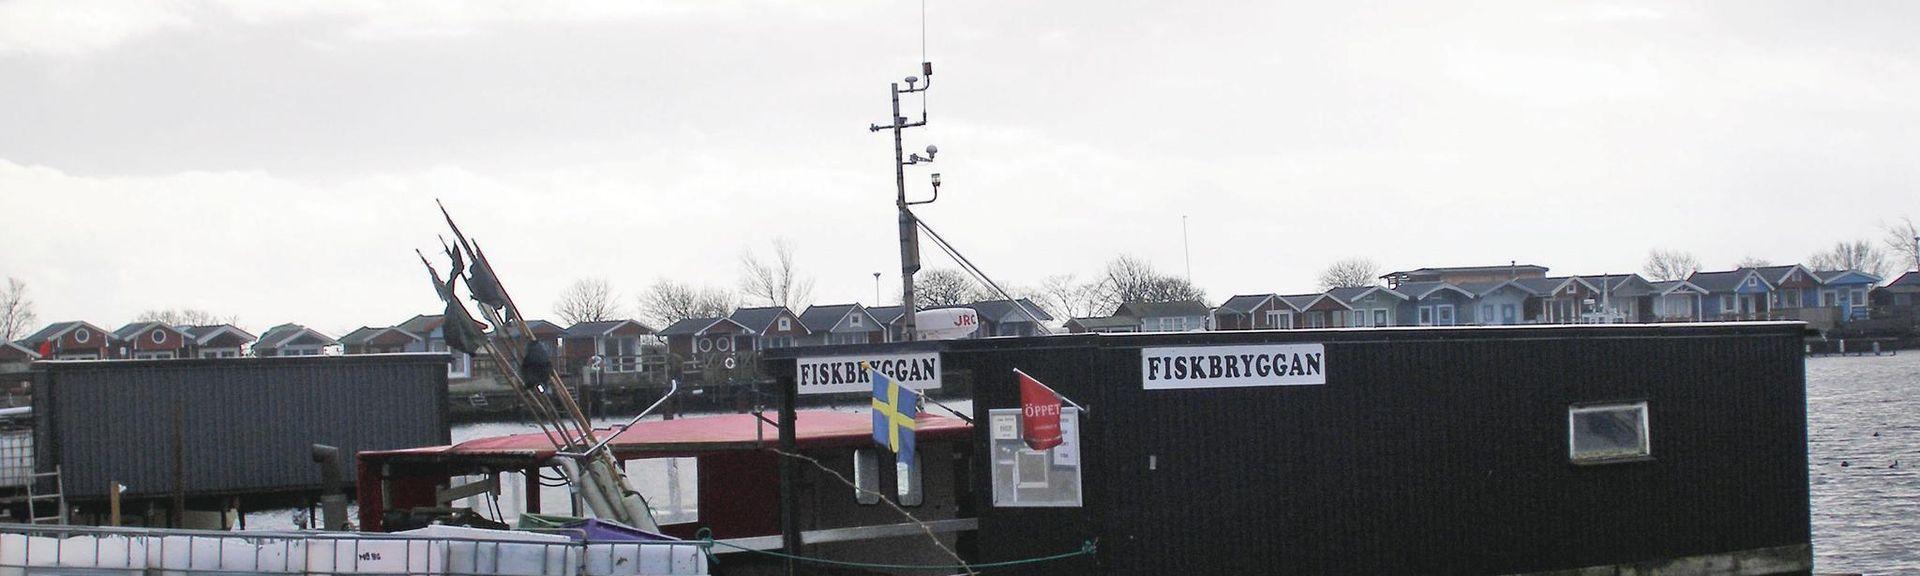 Swedbank Stadion, Malmø, Skåne län, Sverige